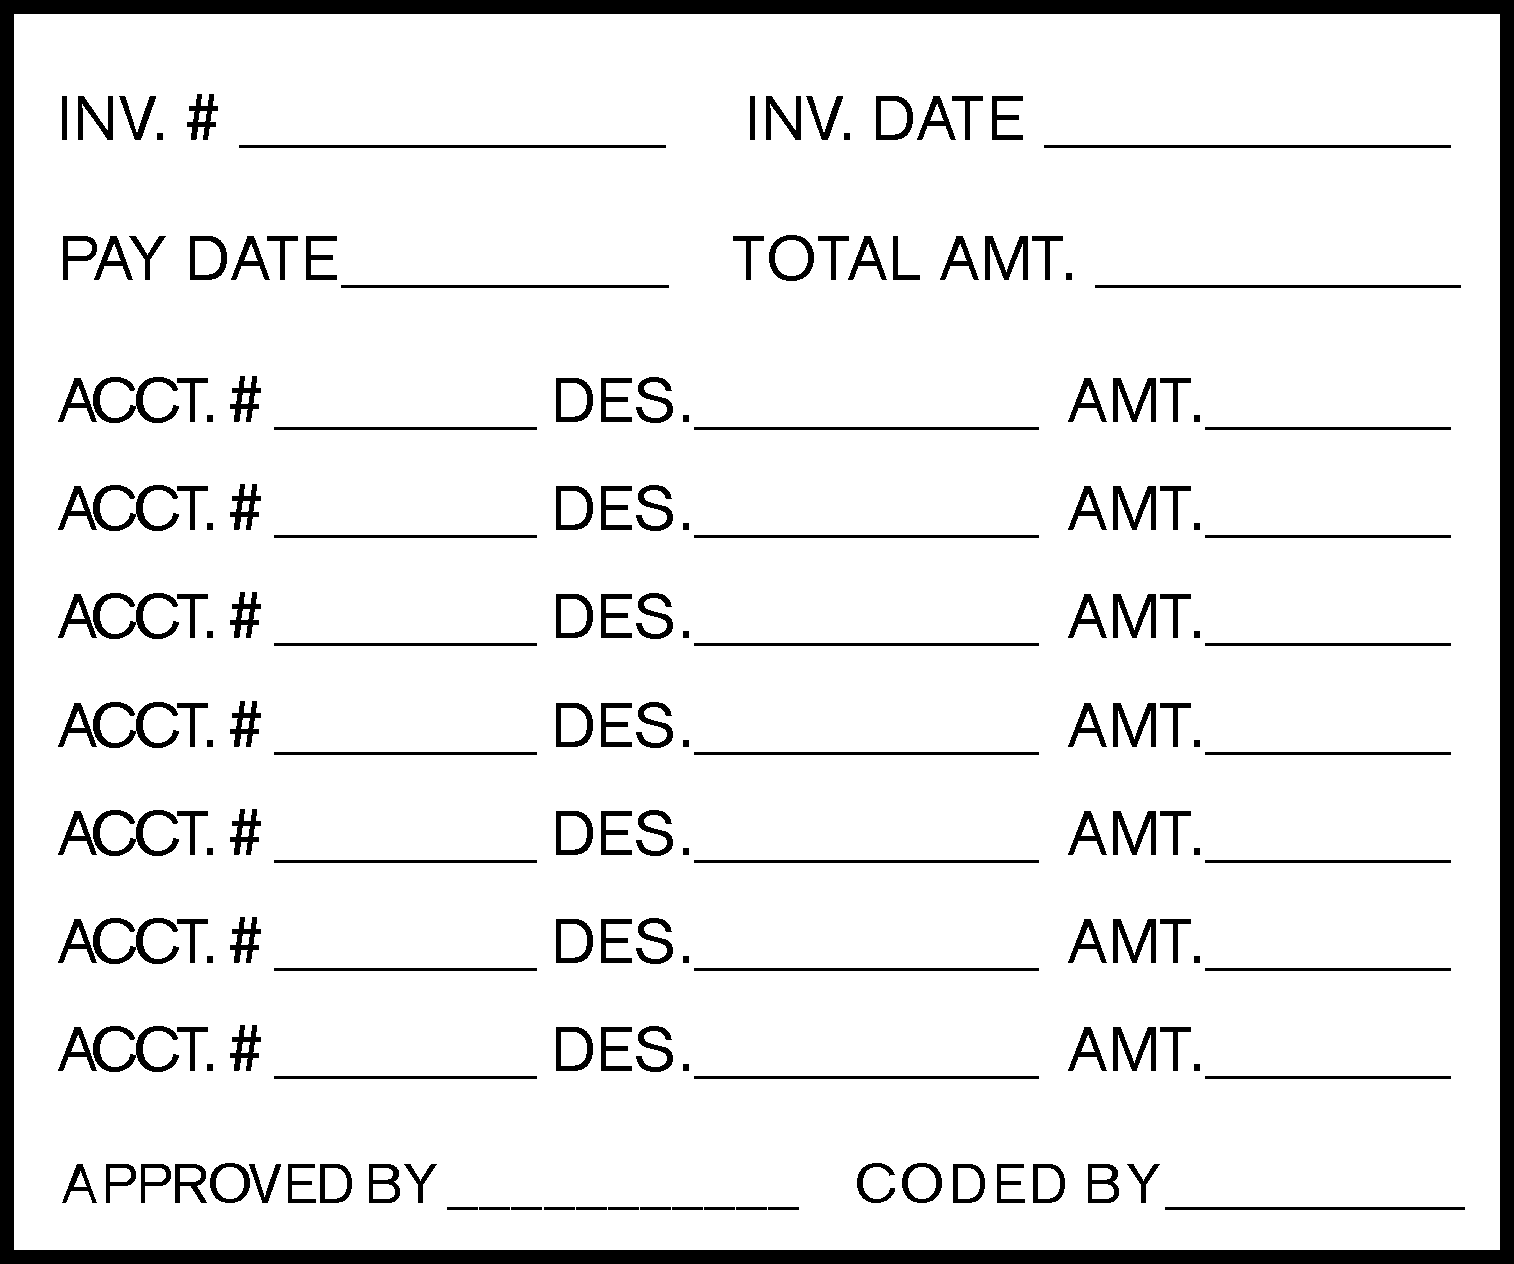 Invoice Coding Rubber Stamp 2 1